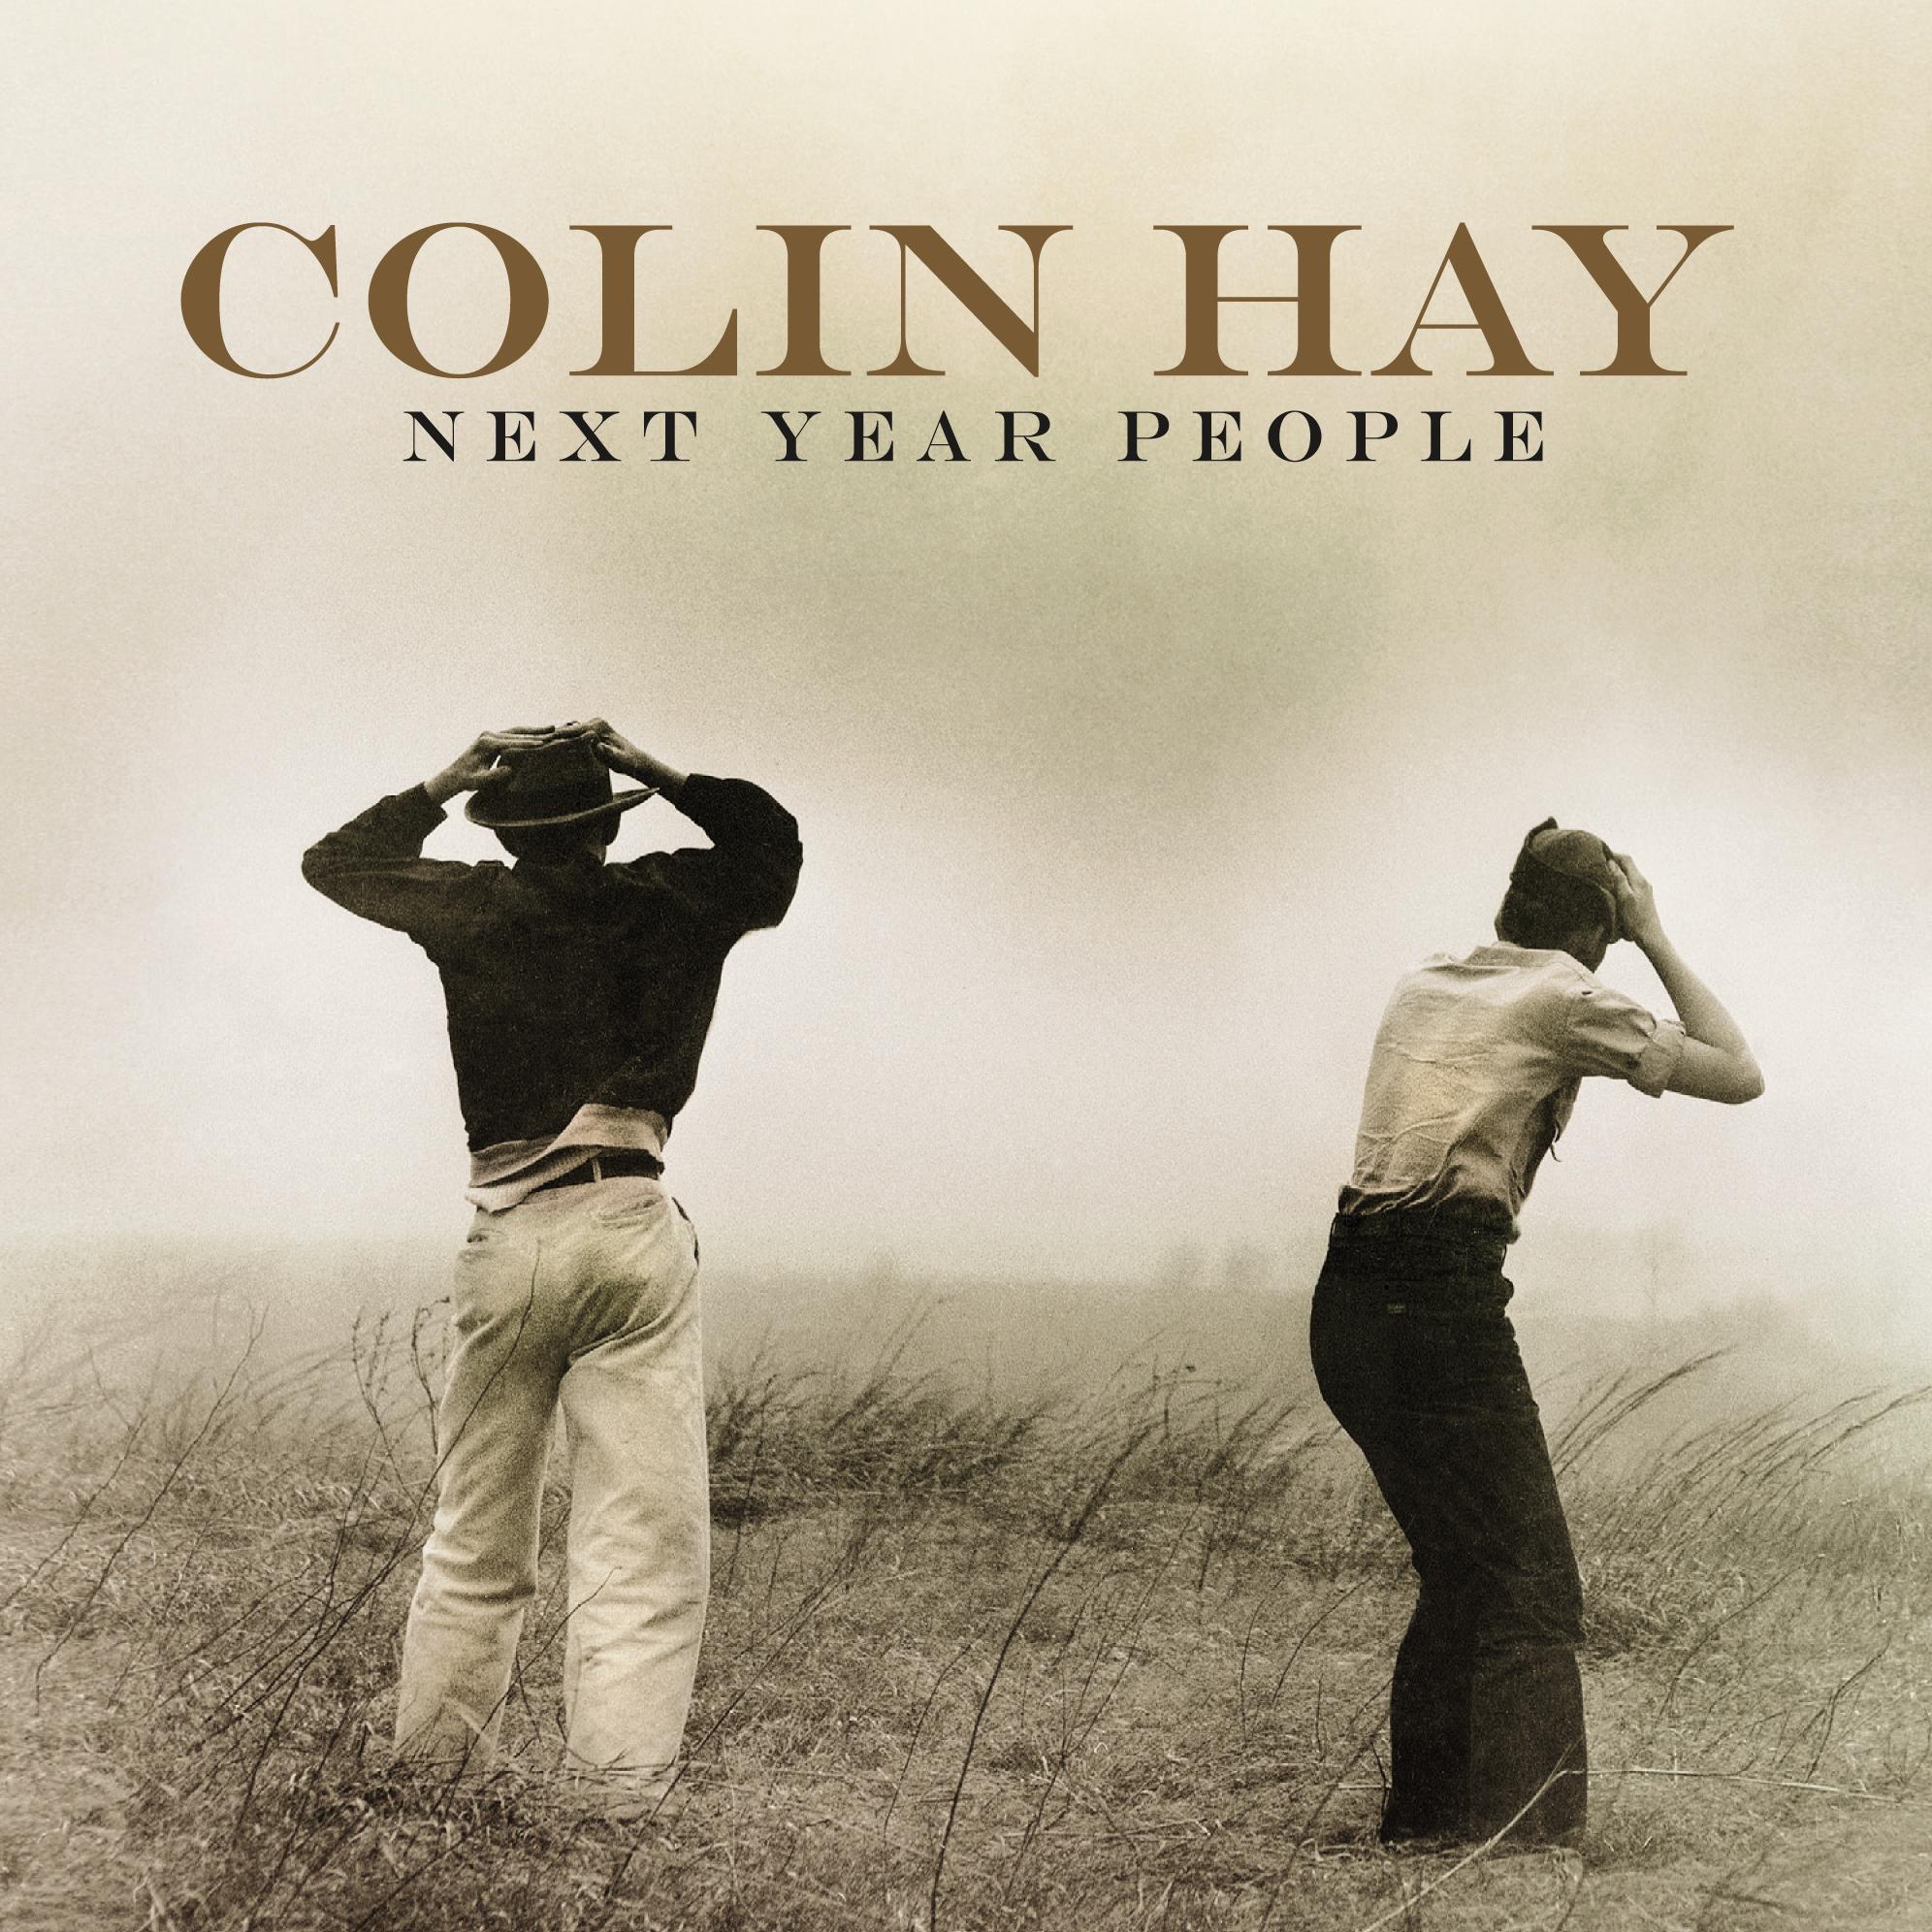 Colin Hay - Next Year People, Album Art